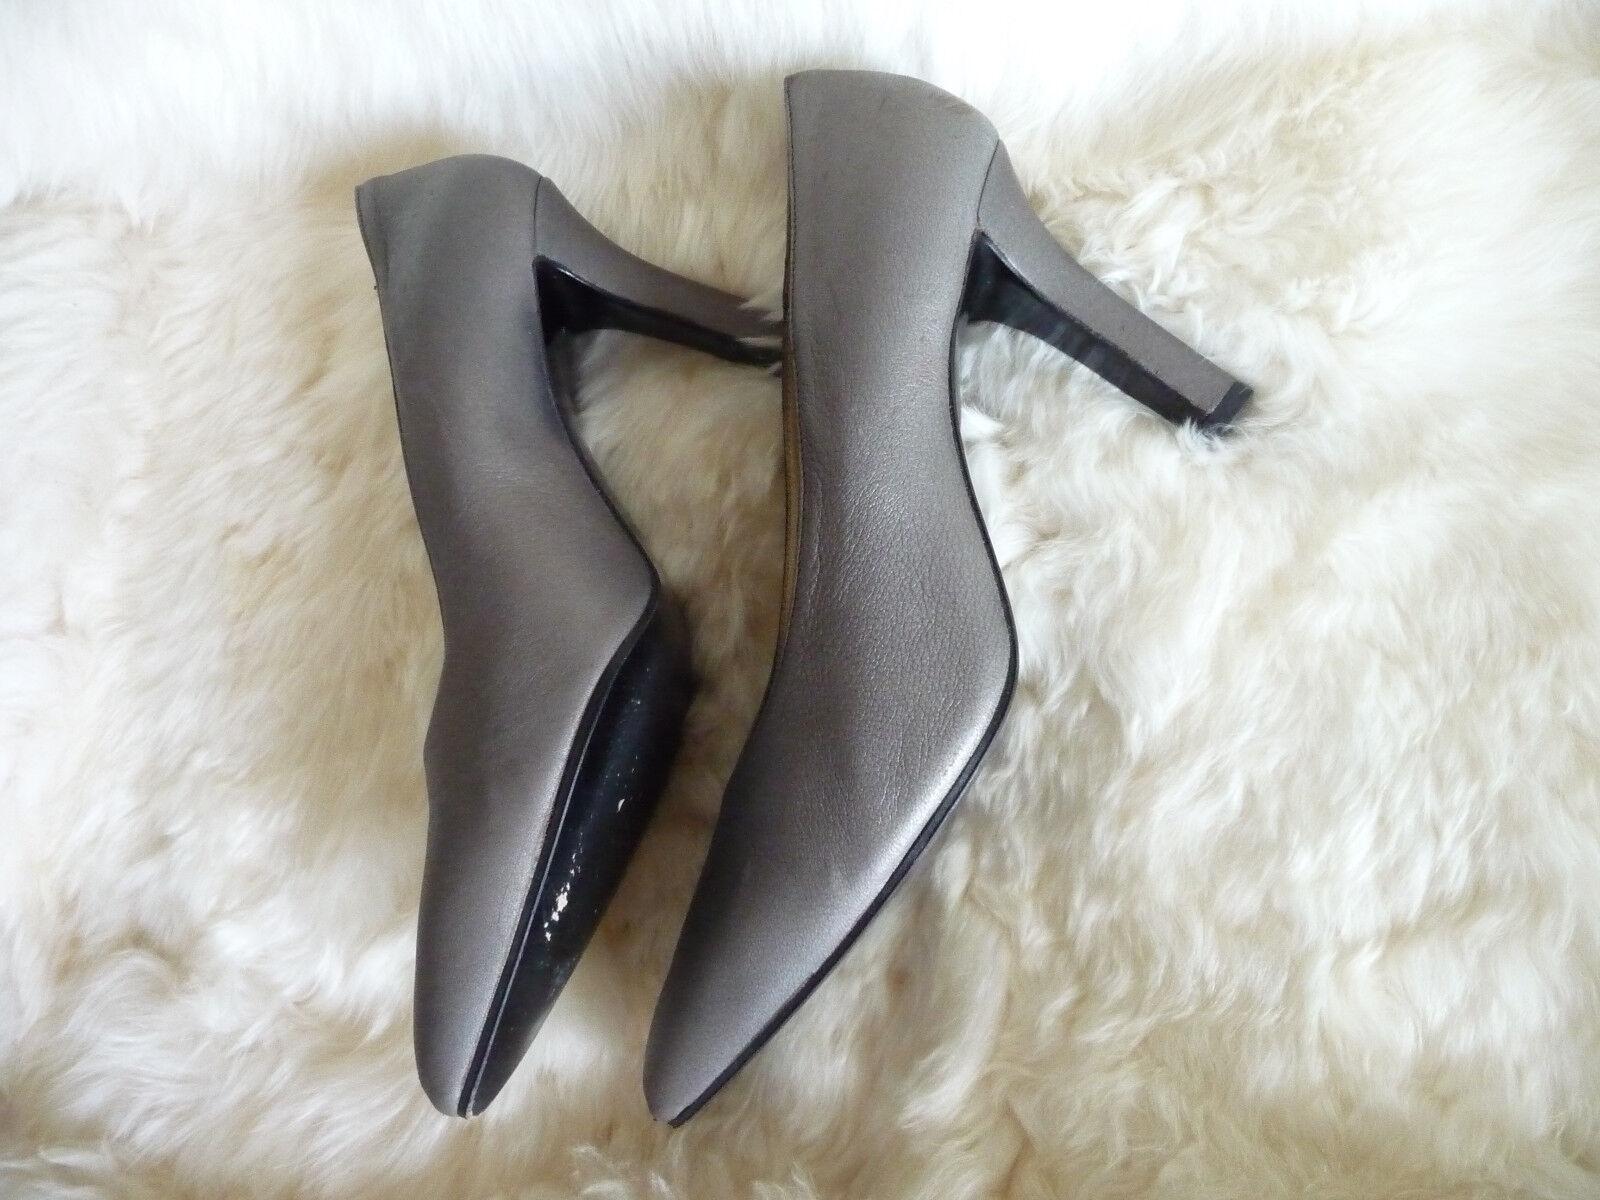 Yves Saint Laurent Silver / Gray Leder Pointed Toe Pumps